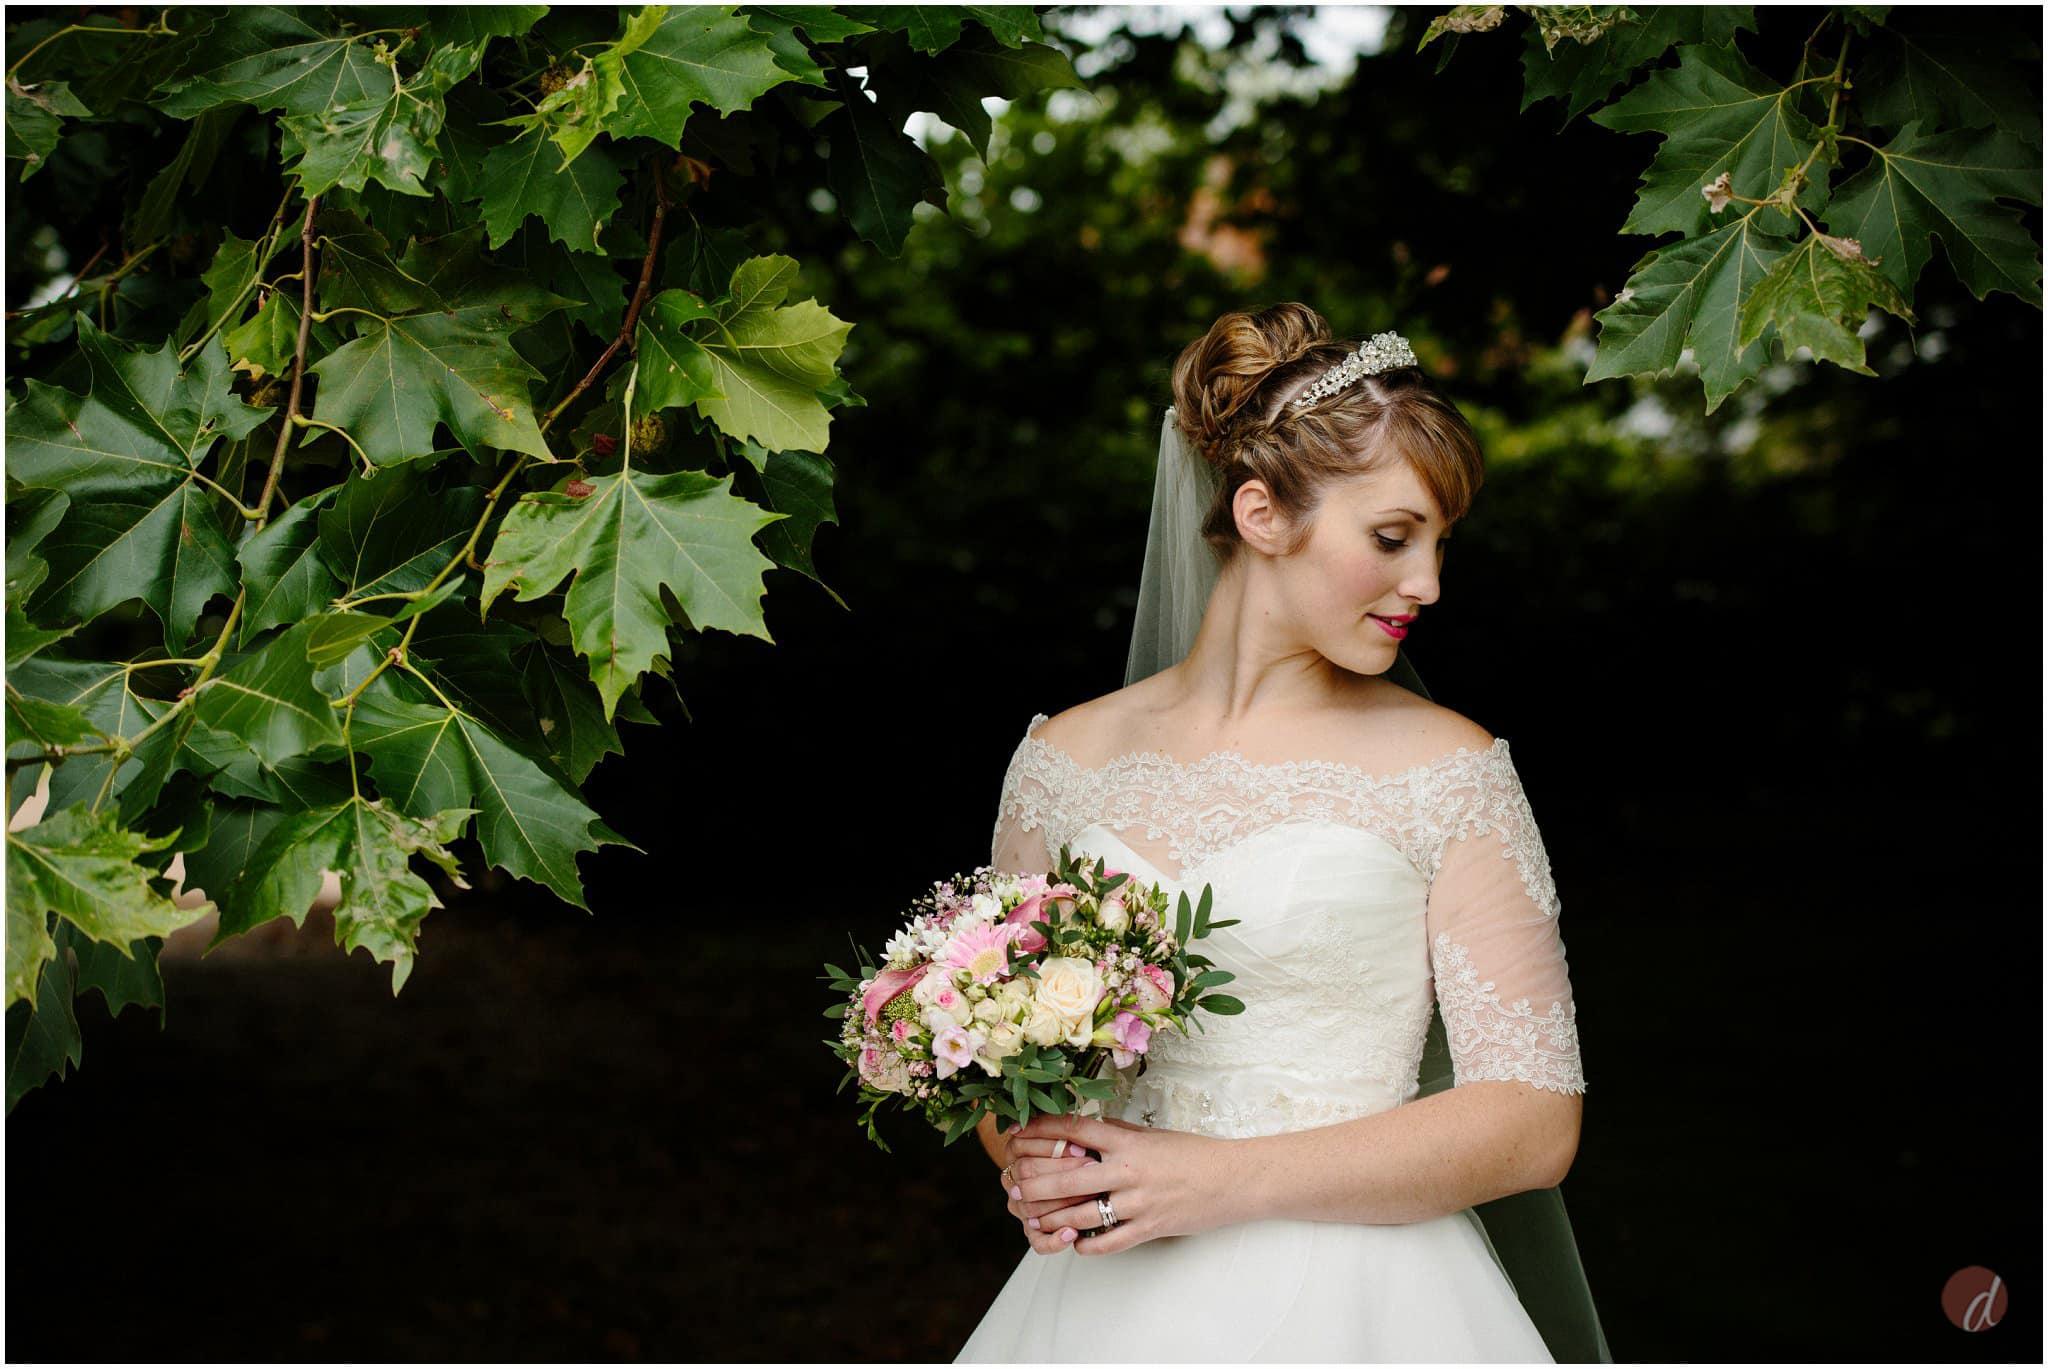 oxonhoath wedding photos